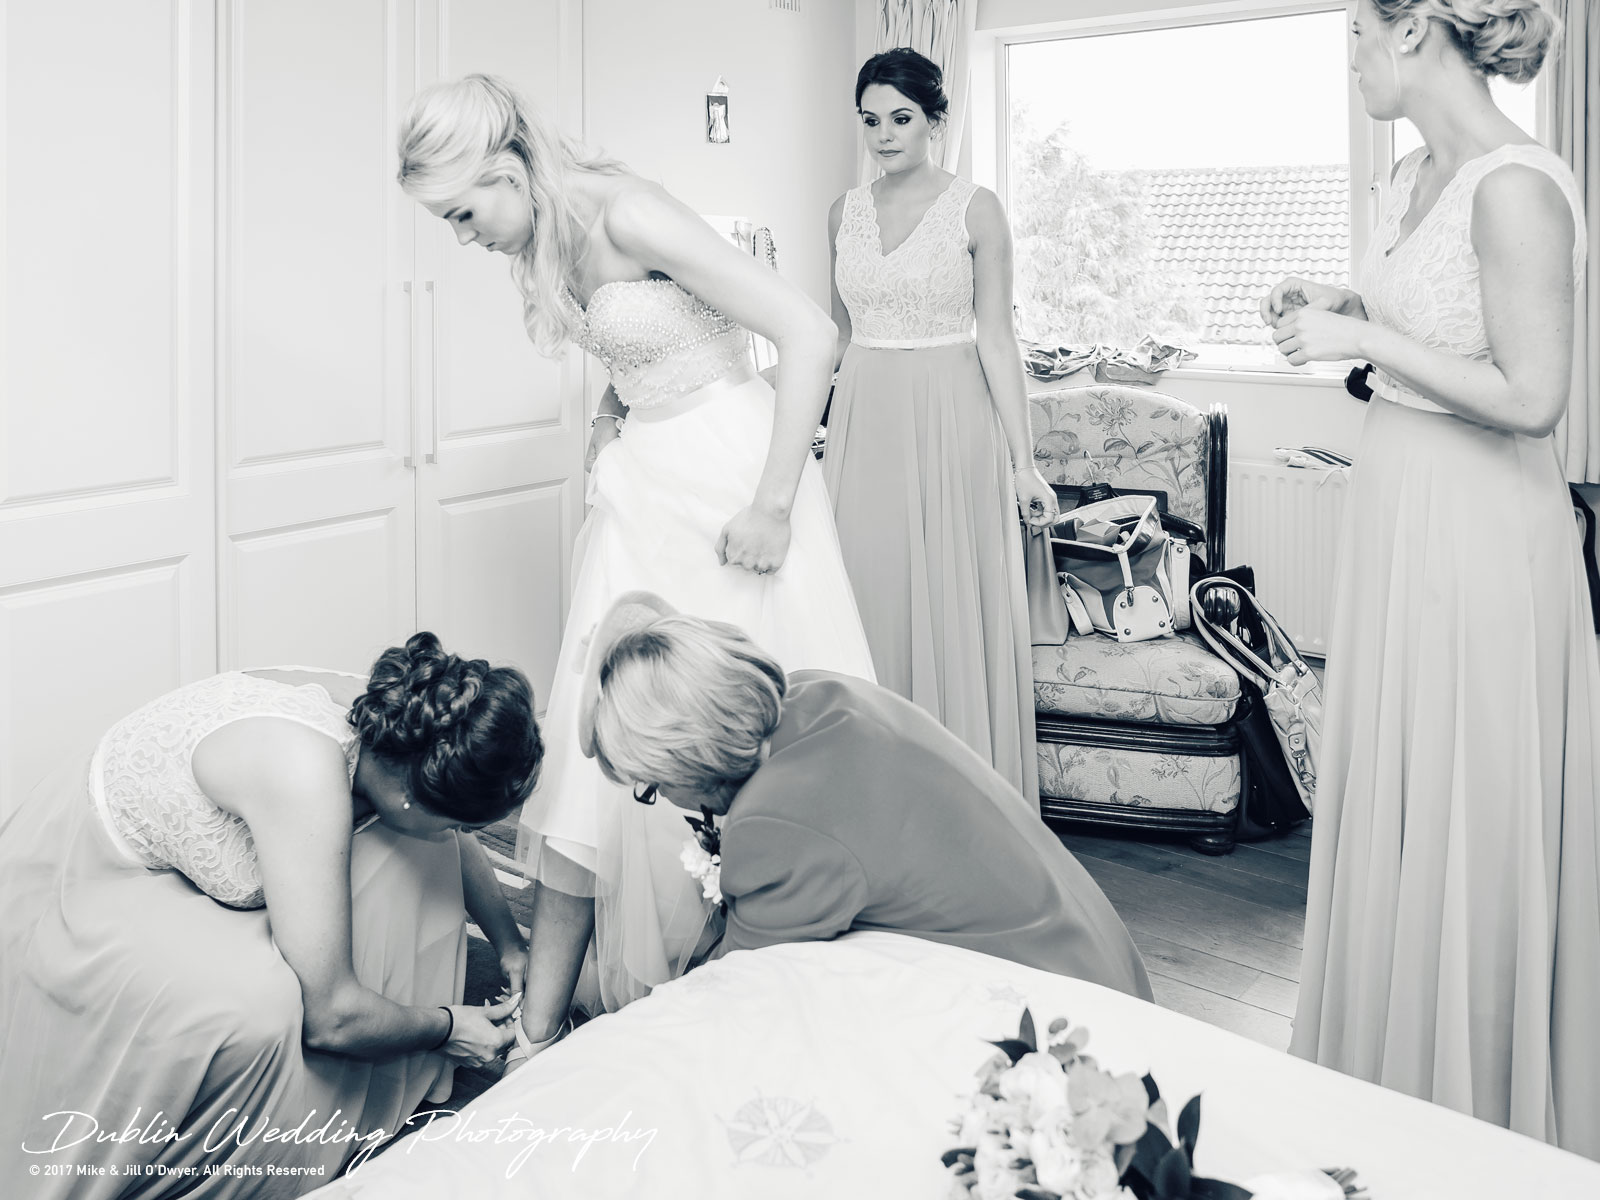 kclub-2017-004.jpgK Club, Kildare, Wedding Photographer, Dublin, Bride and Bridesmaids getting ready